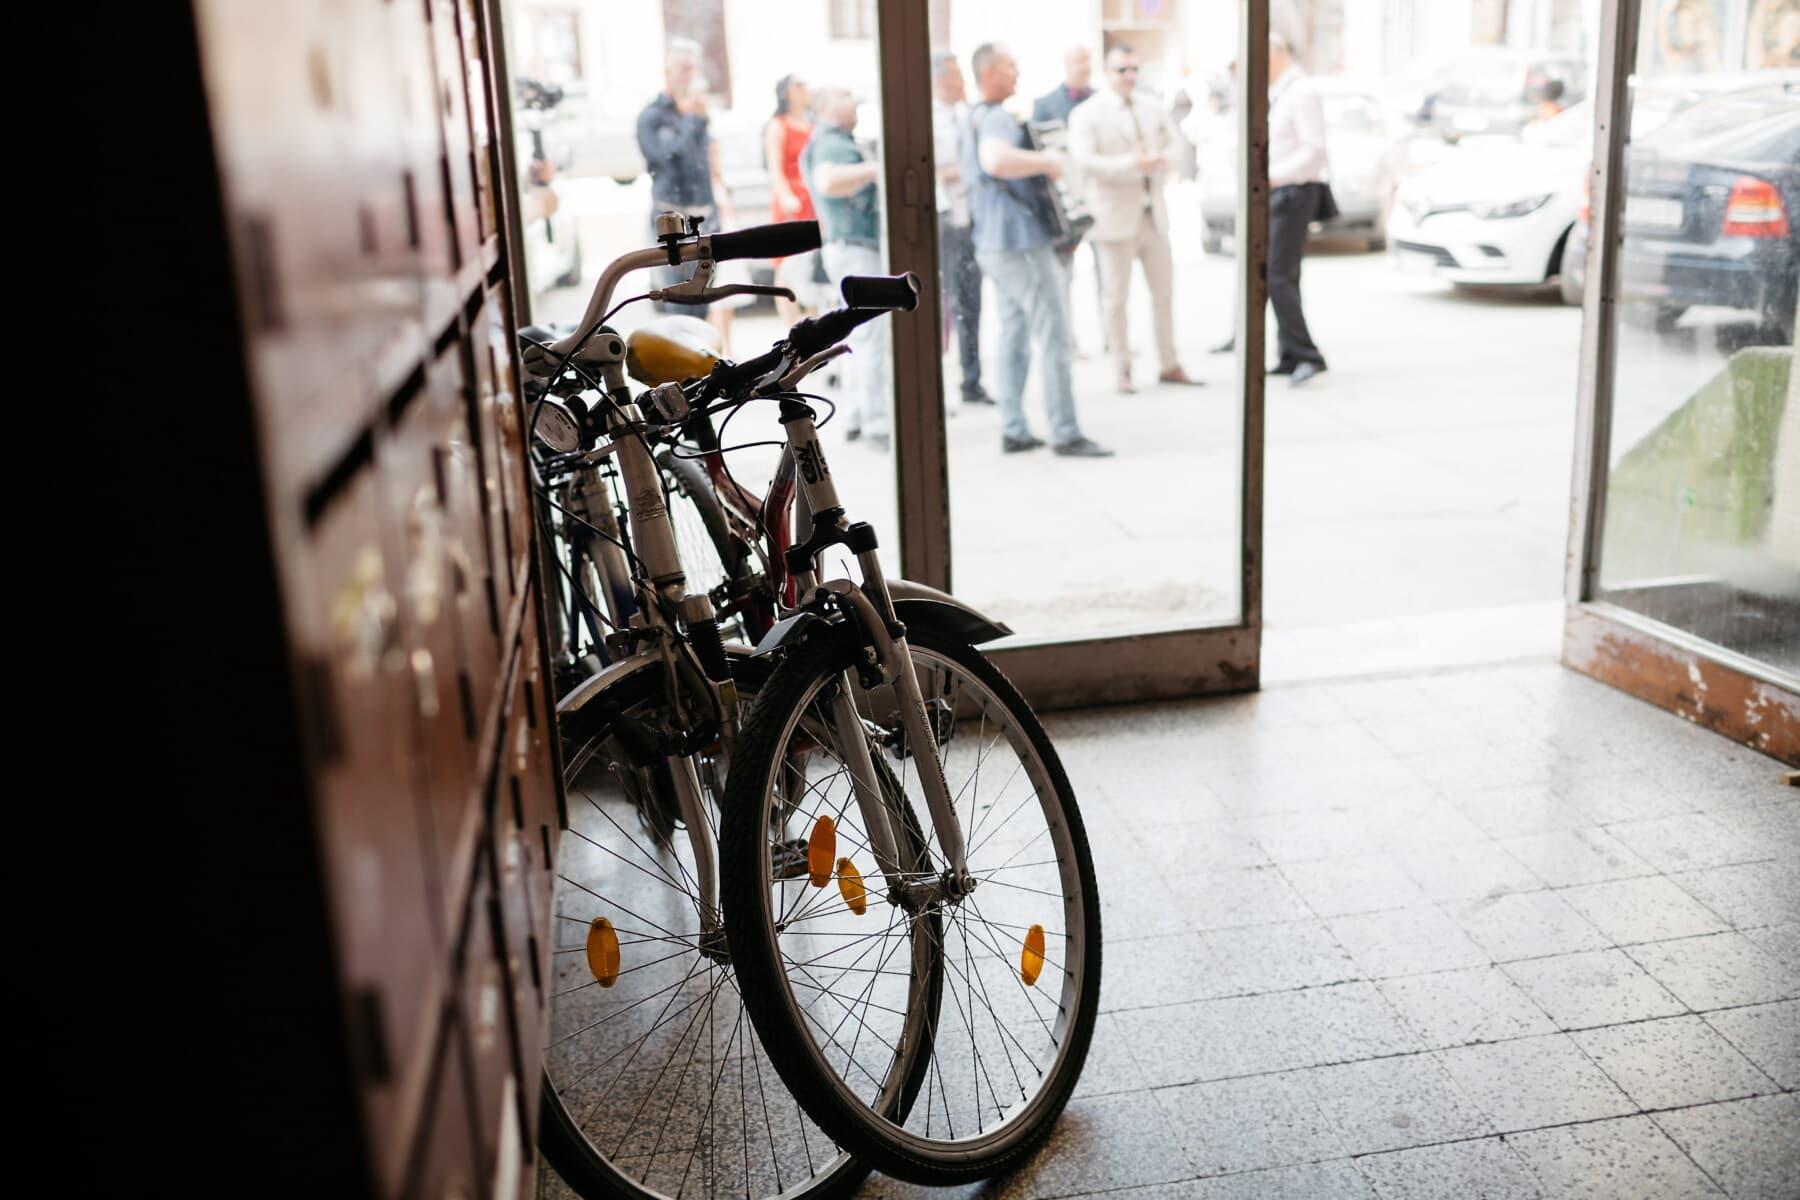 bicycle, front door, inside, building, wheel, bike, street, city, urban, people